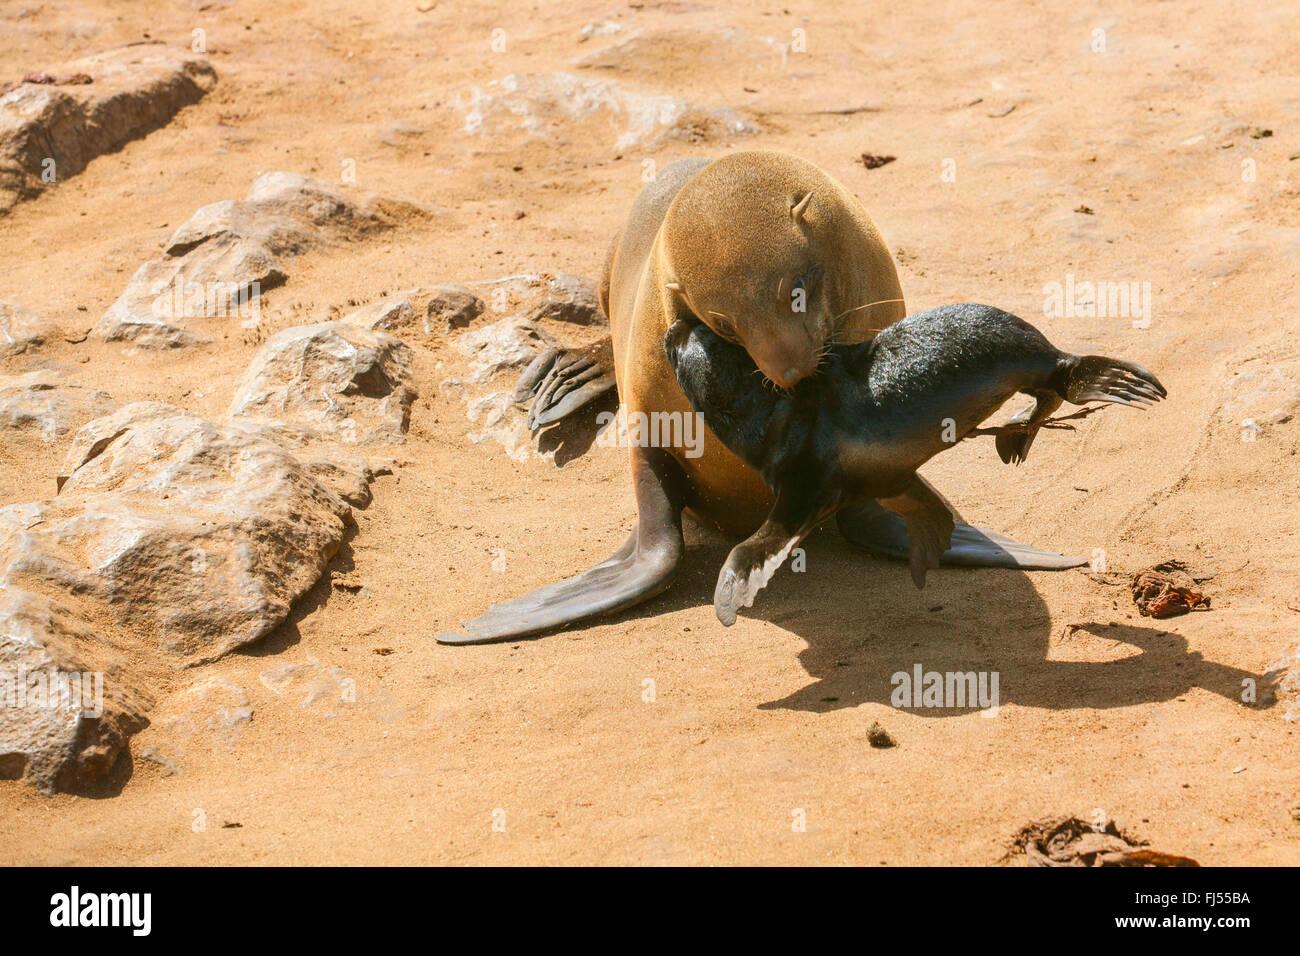 Foca peletera sudafricana, Cabo (Arctocephalus pusillus pusillus, Arctocephalus pusillus), una foca madre con su Foto de stock